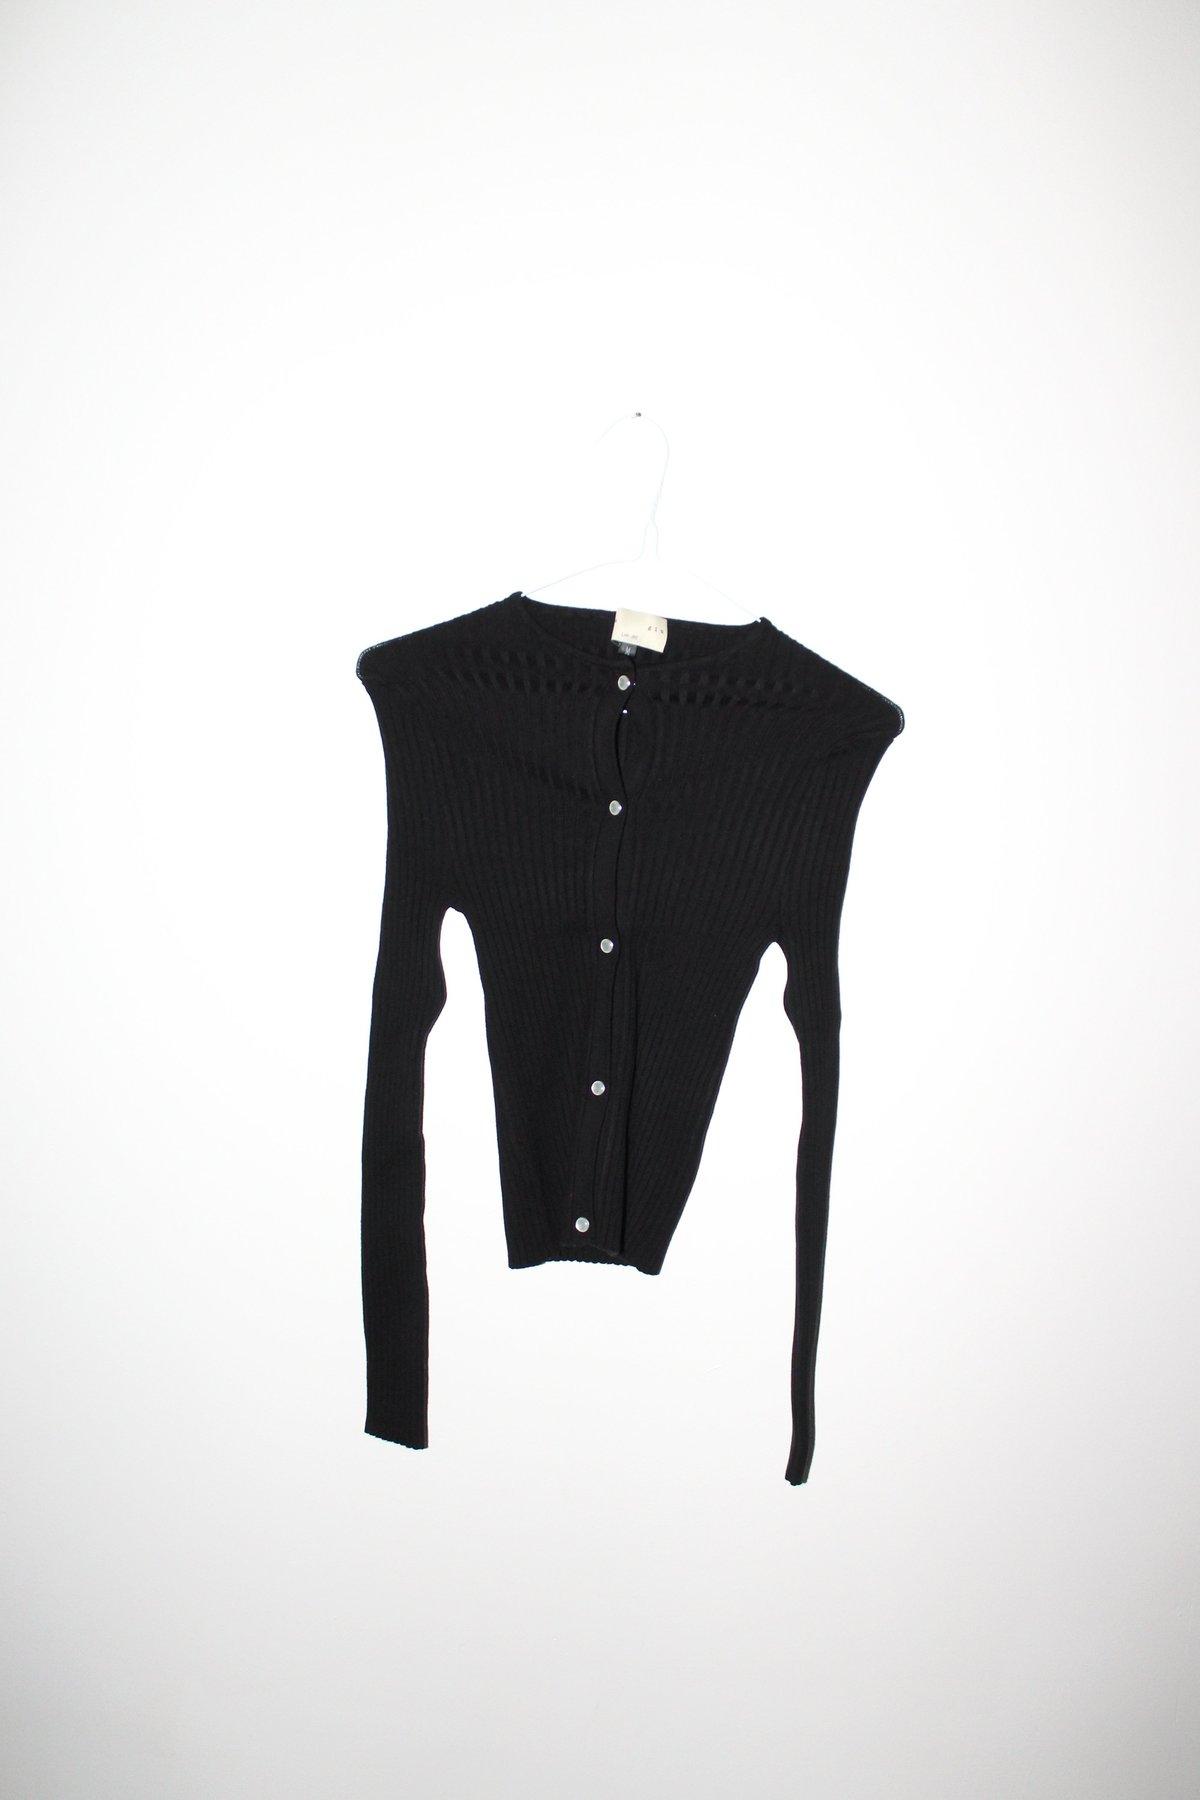 Nonna Pearl Cardigan Sweater by Giu Giu, available on garmentory.com for $357 Kim Kardashian Top Exact Product